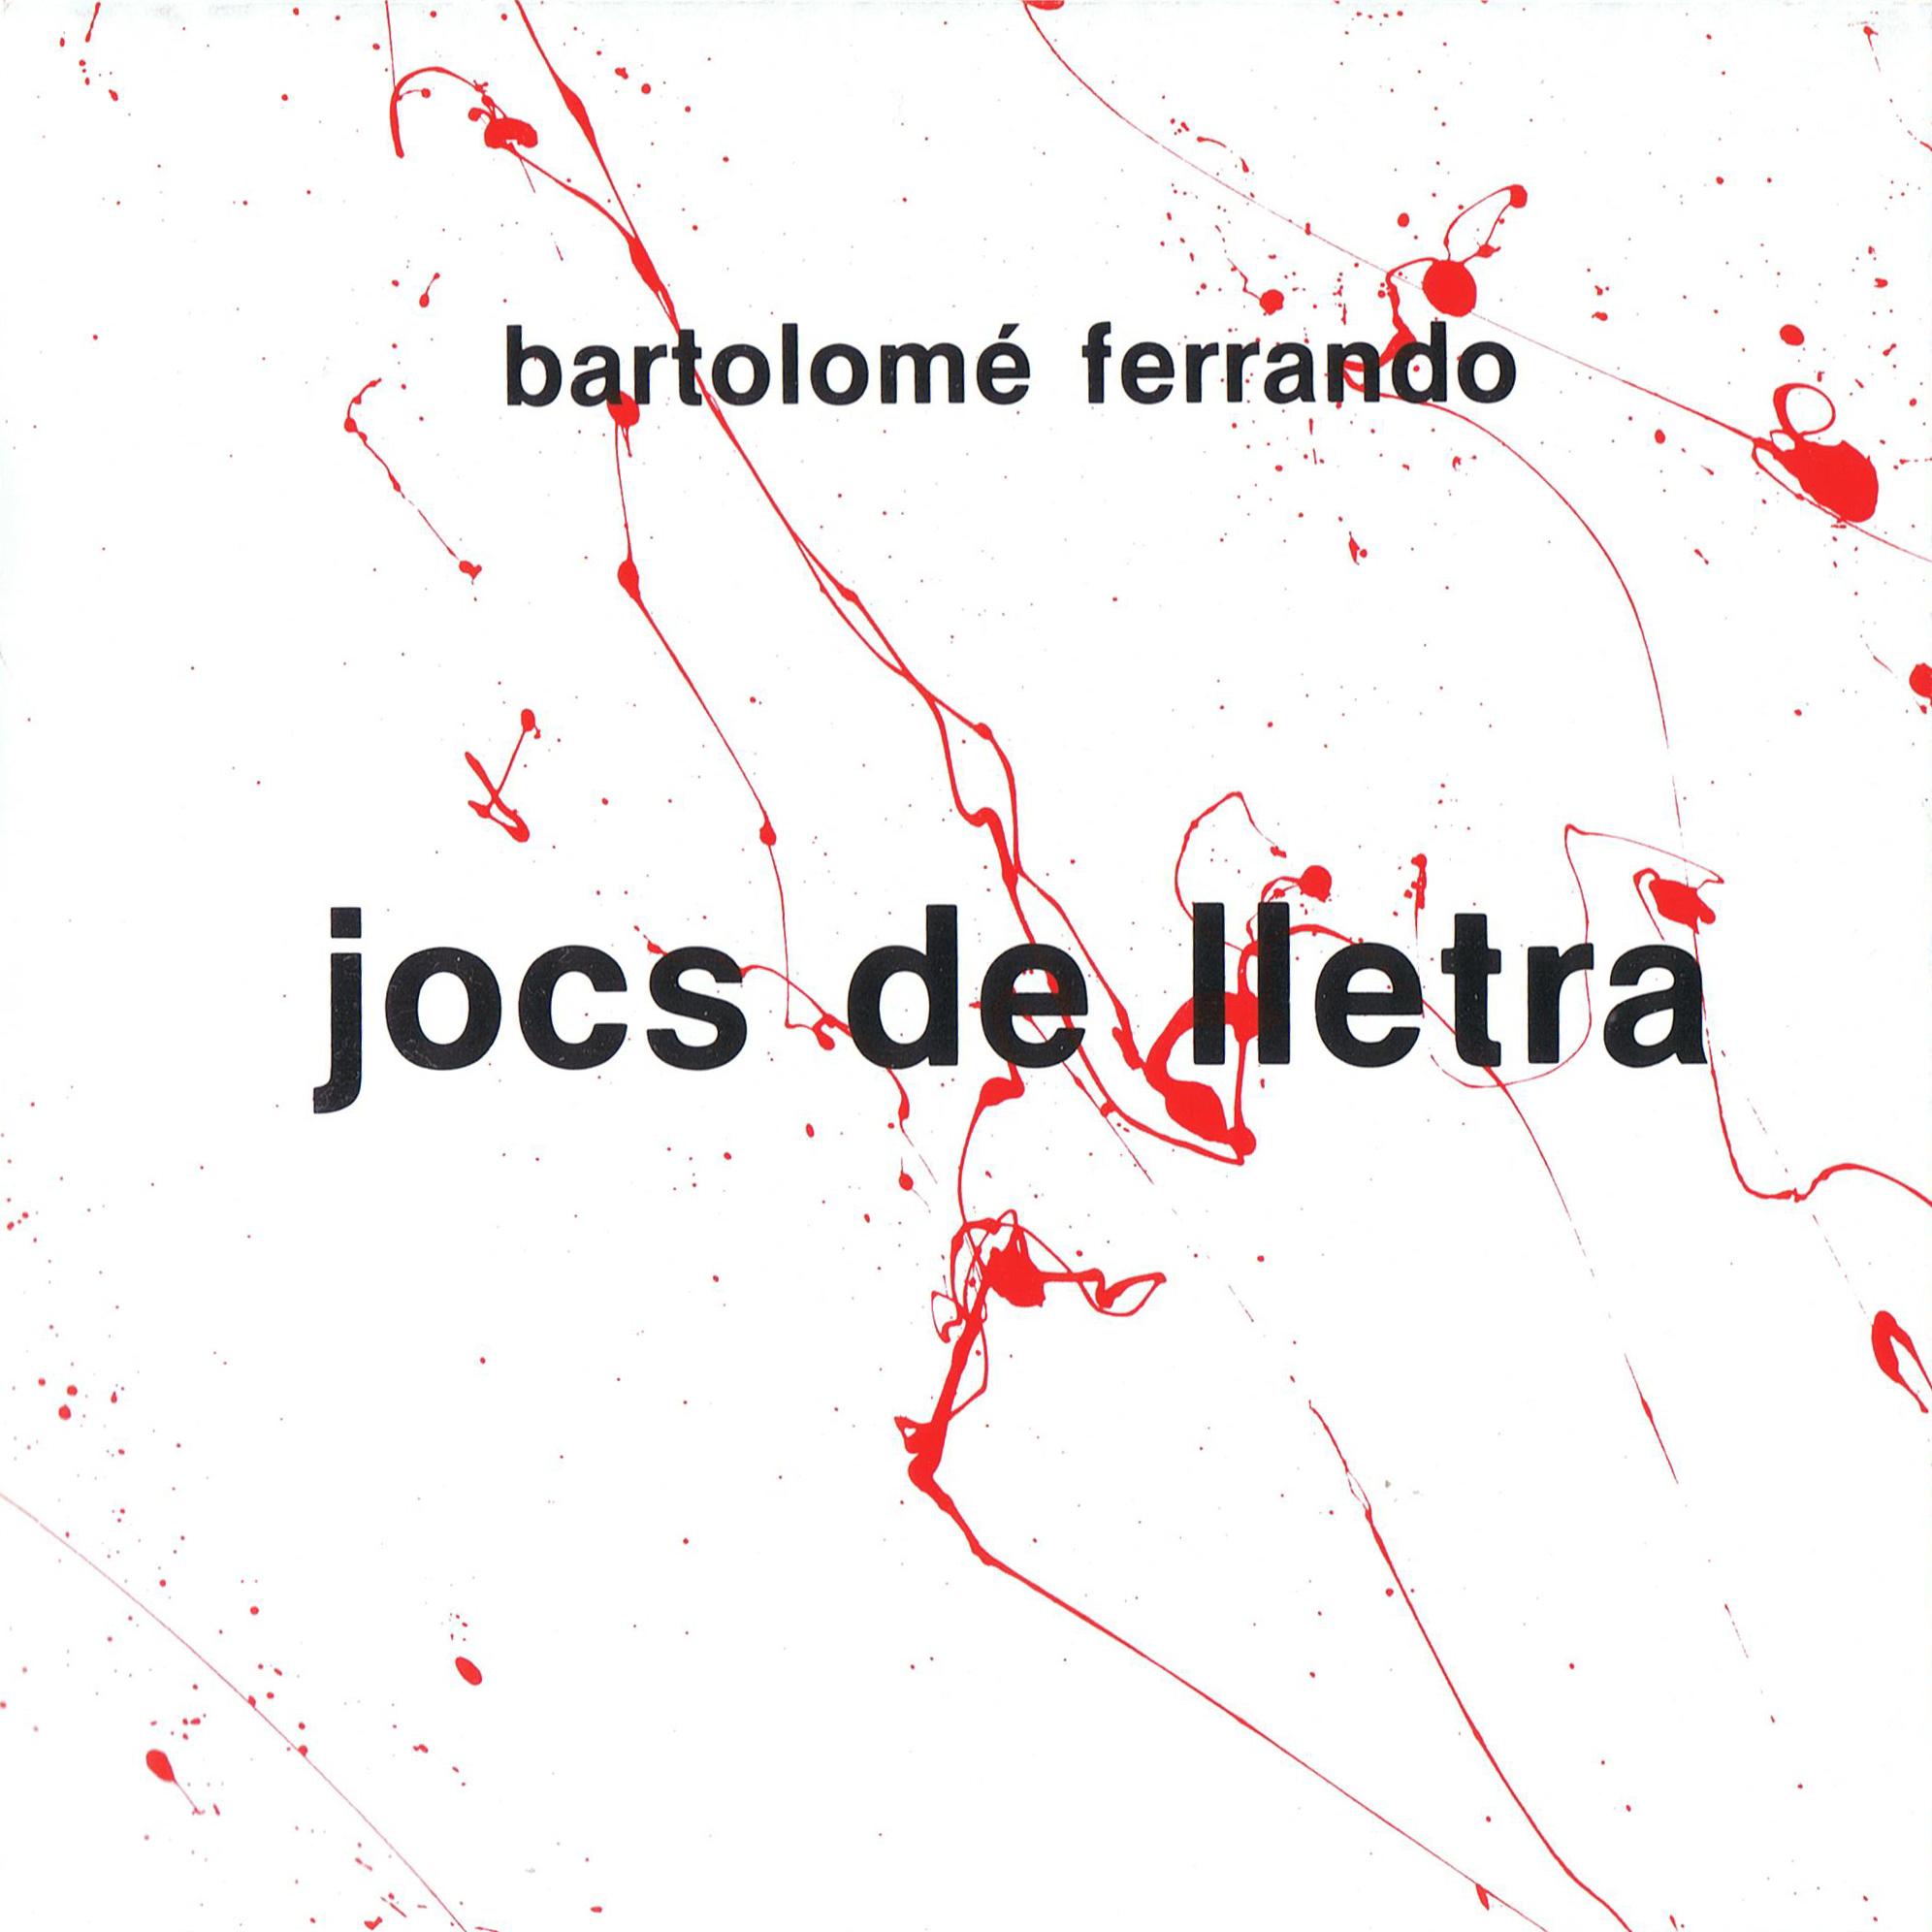 Portada catálogo Jocs de lletra, Bartolome Ferrando 1987